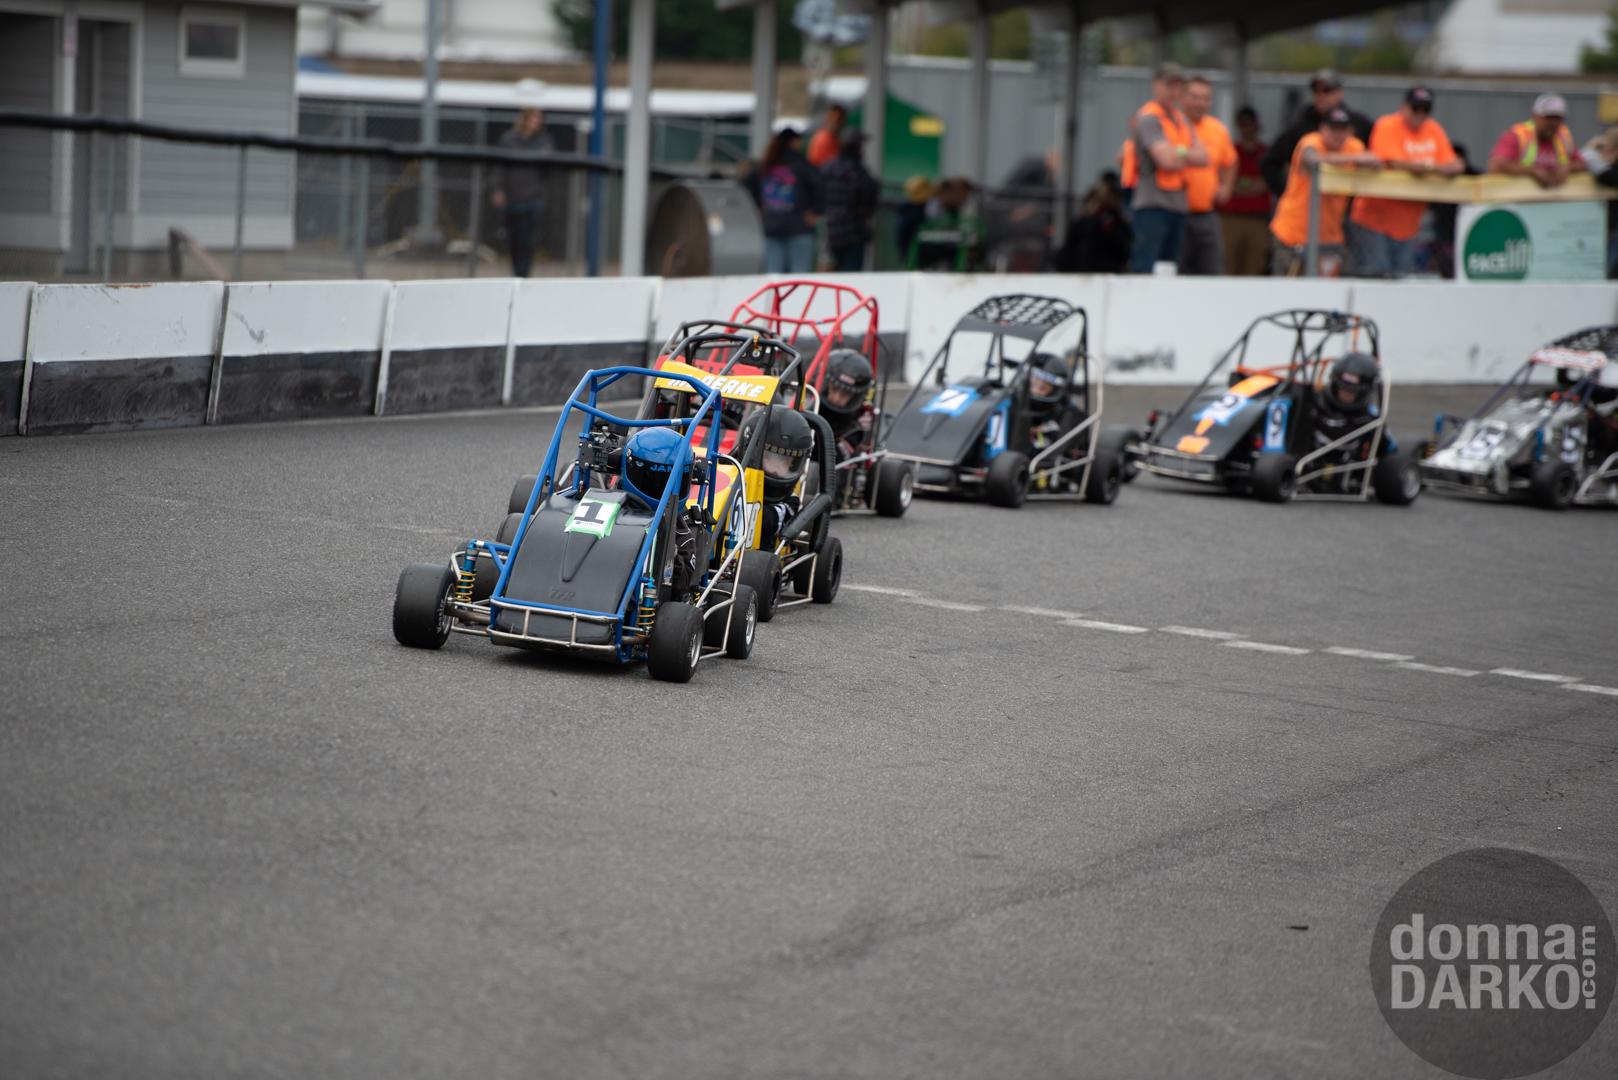 QWMA (Racing) 8-11-2019 DSC_6032.jpg